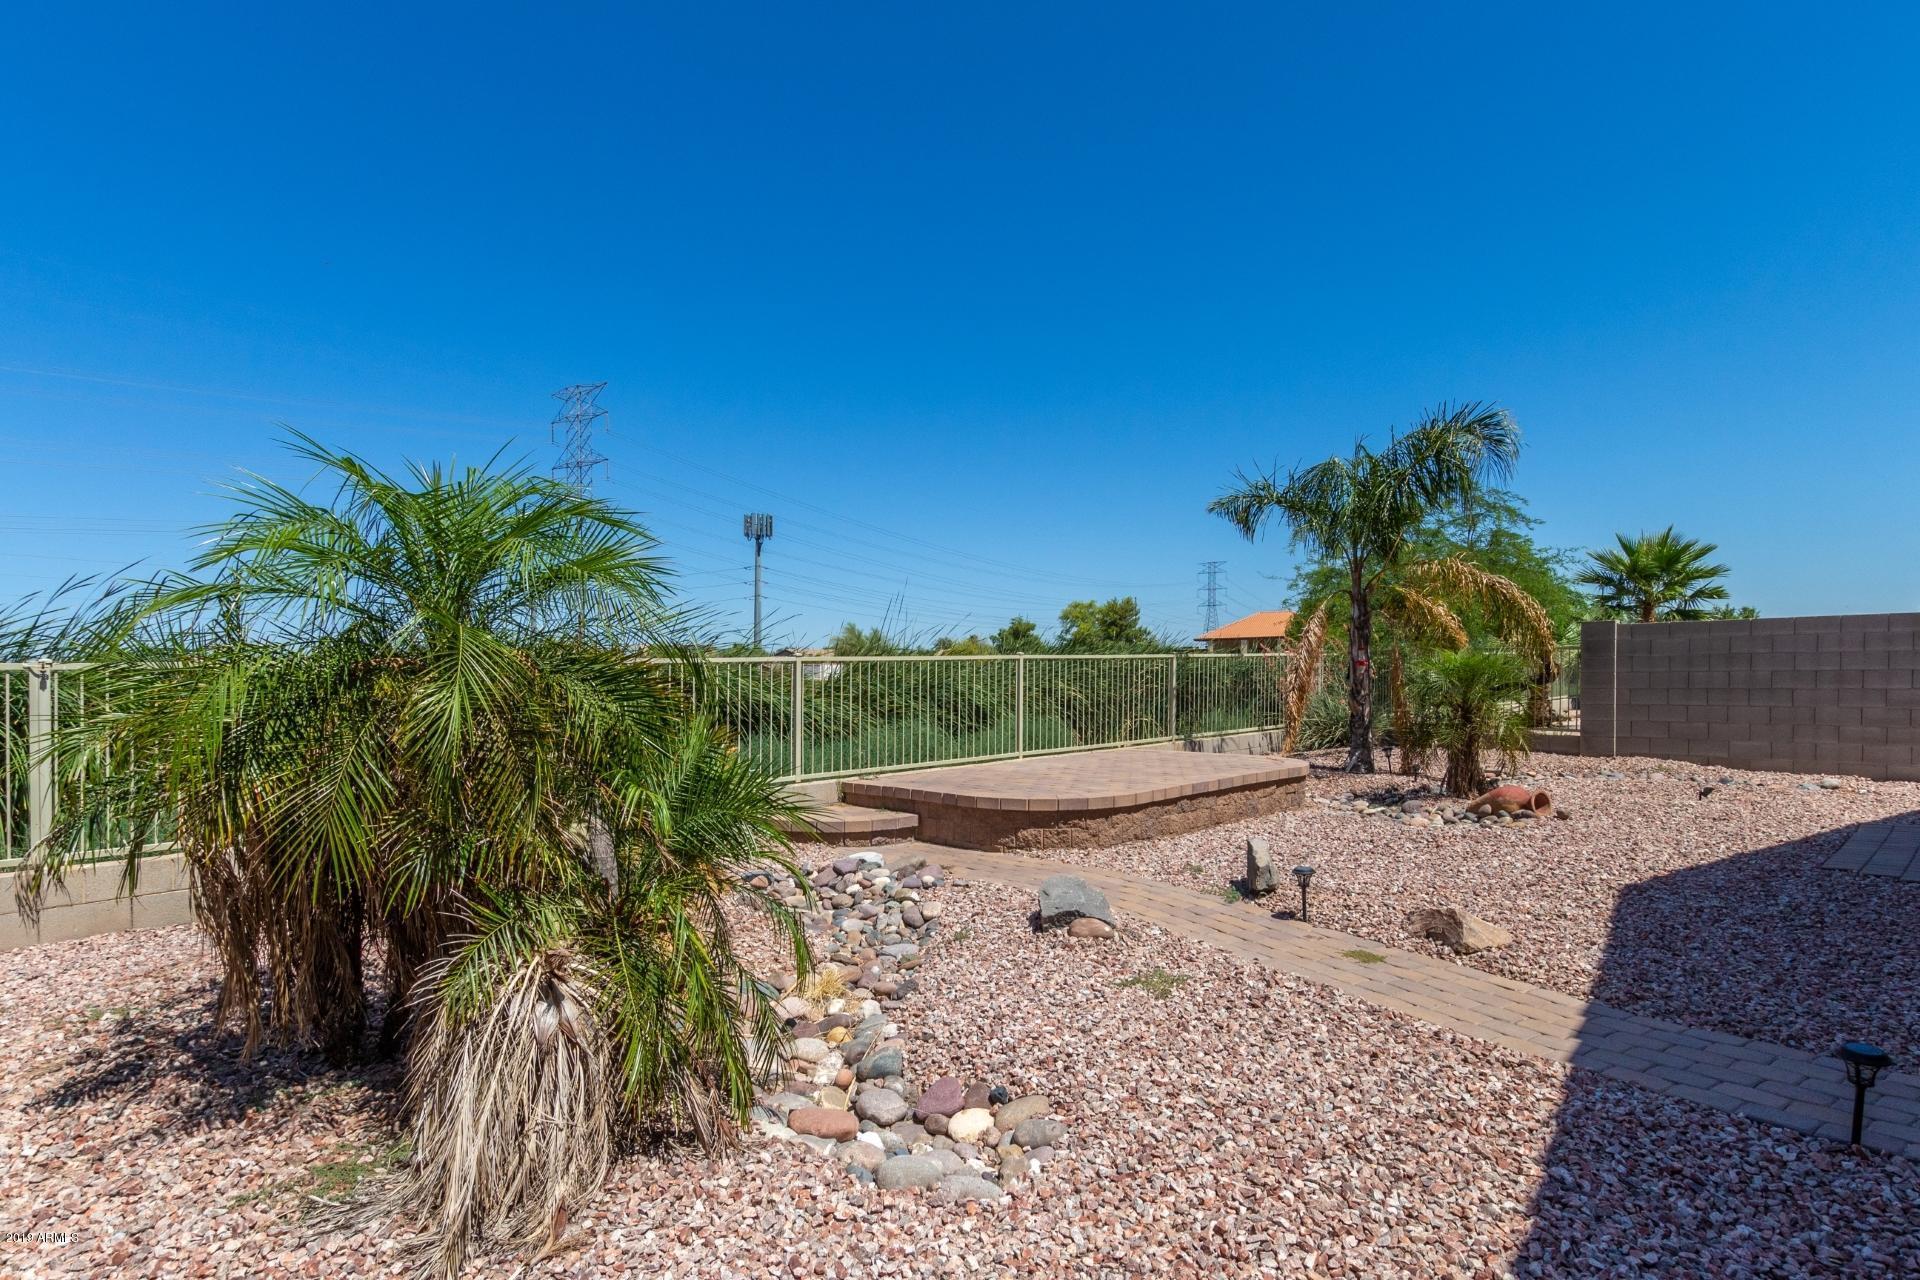 MLS 5940349 20 S 120TH Avenue, Avondale, AZ 85323 Avondale AZ Golf